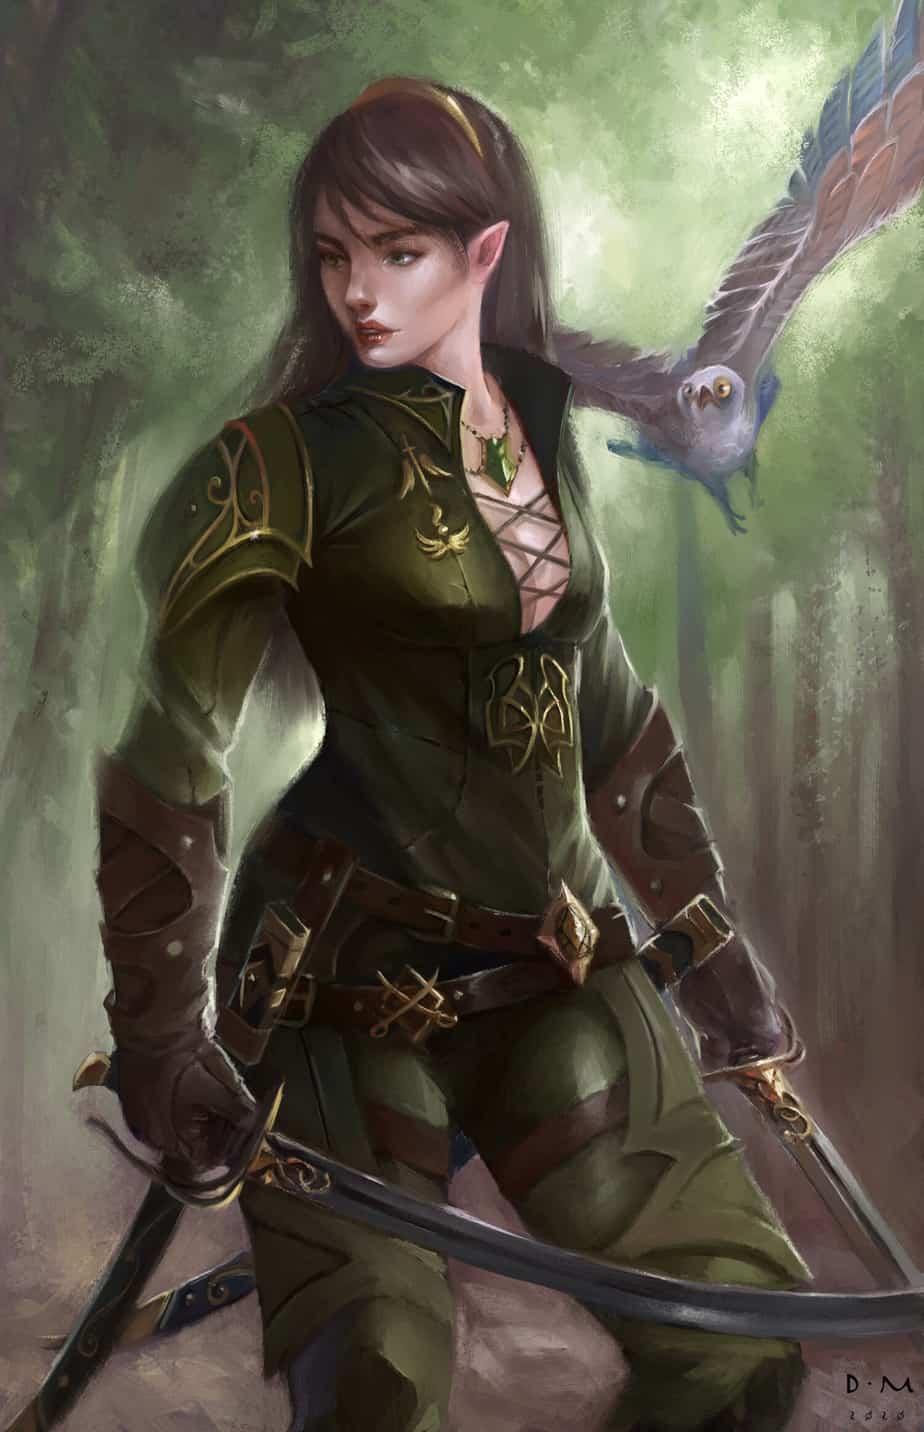 D&D 5e: Half-Elf Ranger Guide